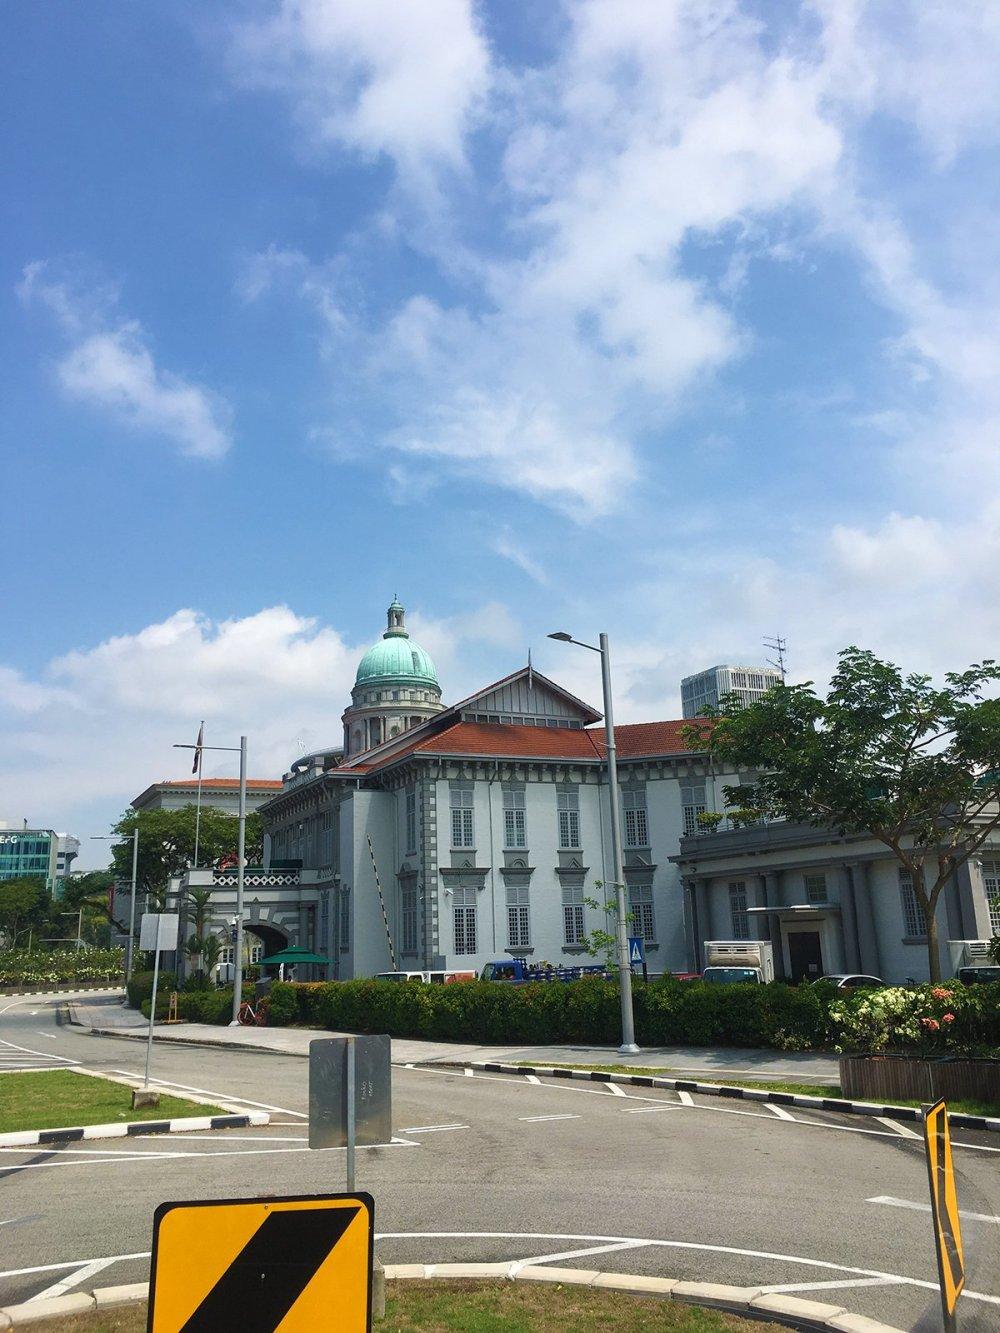 DUCKTOURS SINGAPORE SCENERY 7